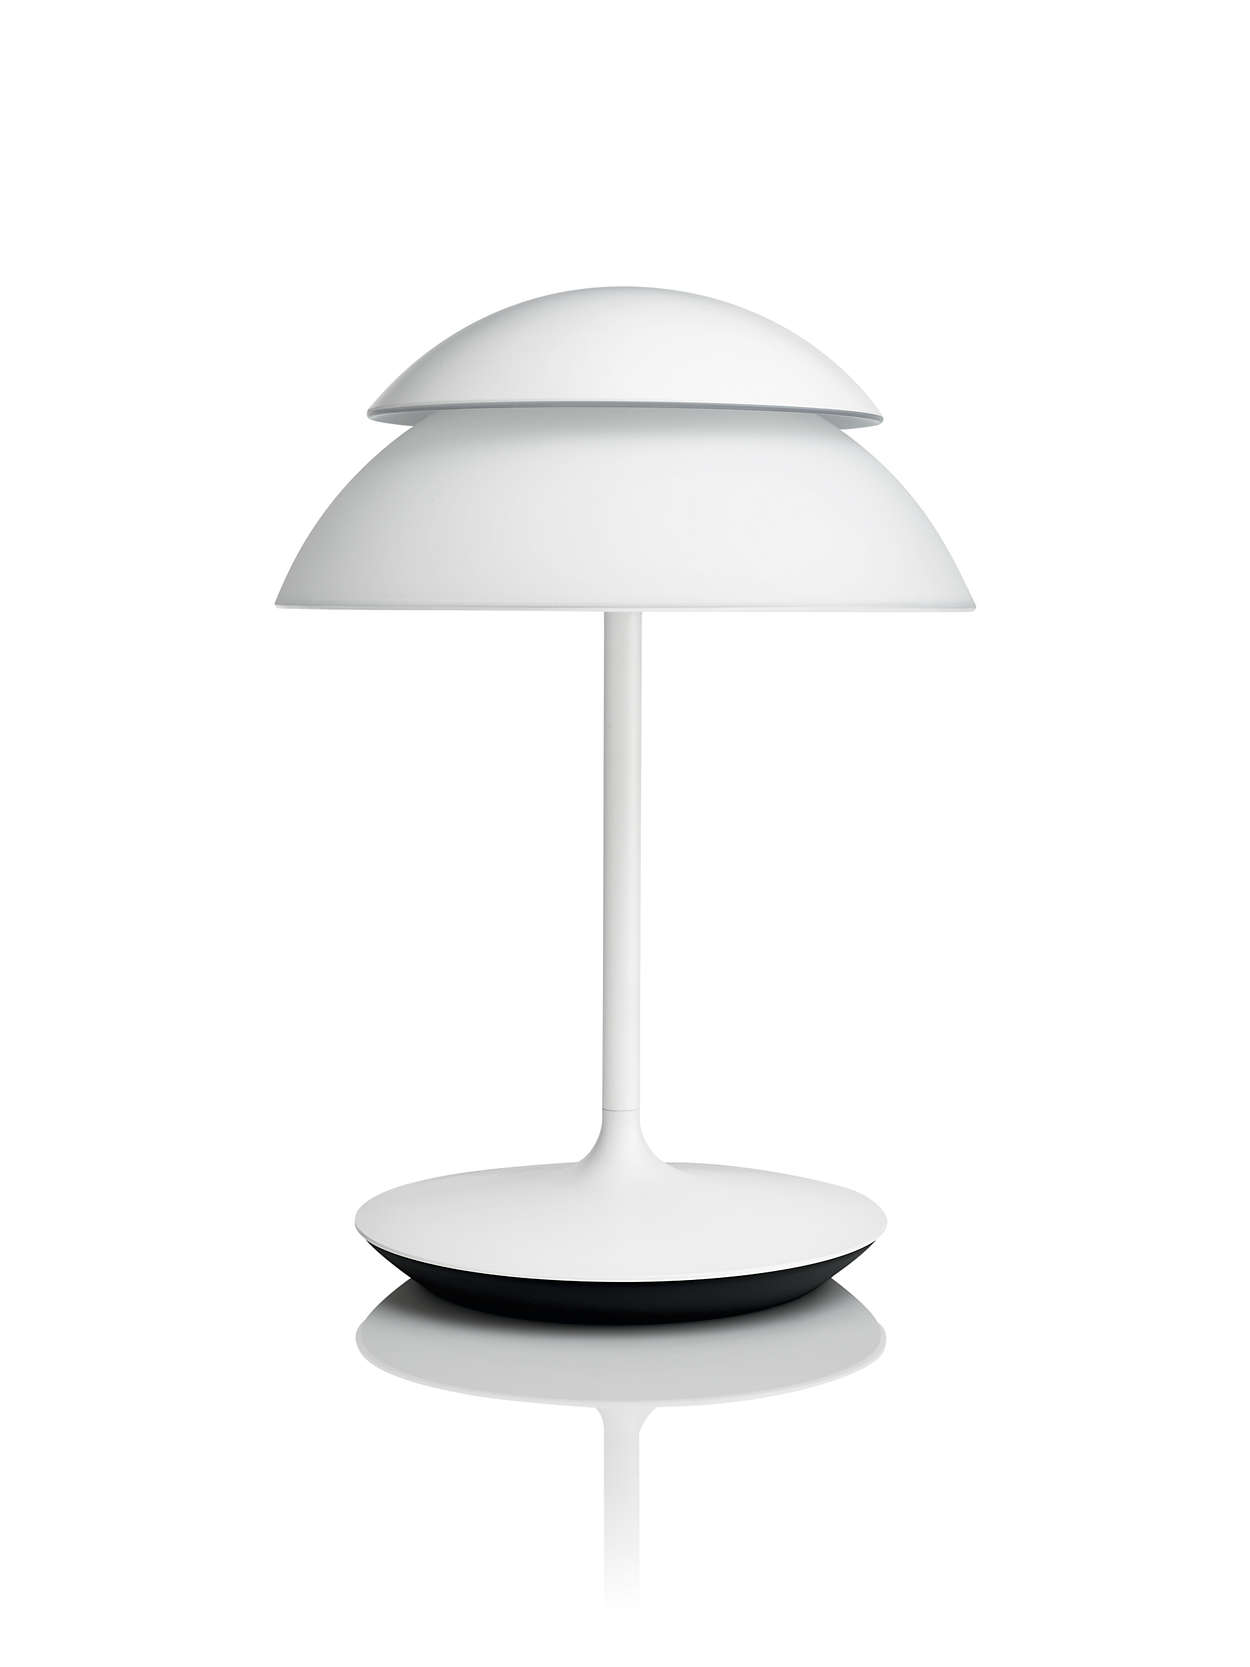 tischleuchte 7121231ph philips. Black Bedroom Furniture Sets. Home Design Ideas